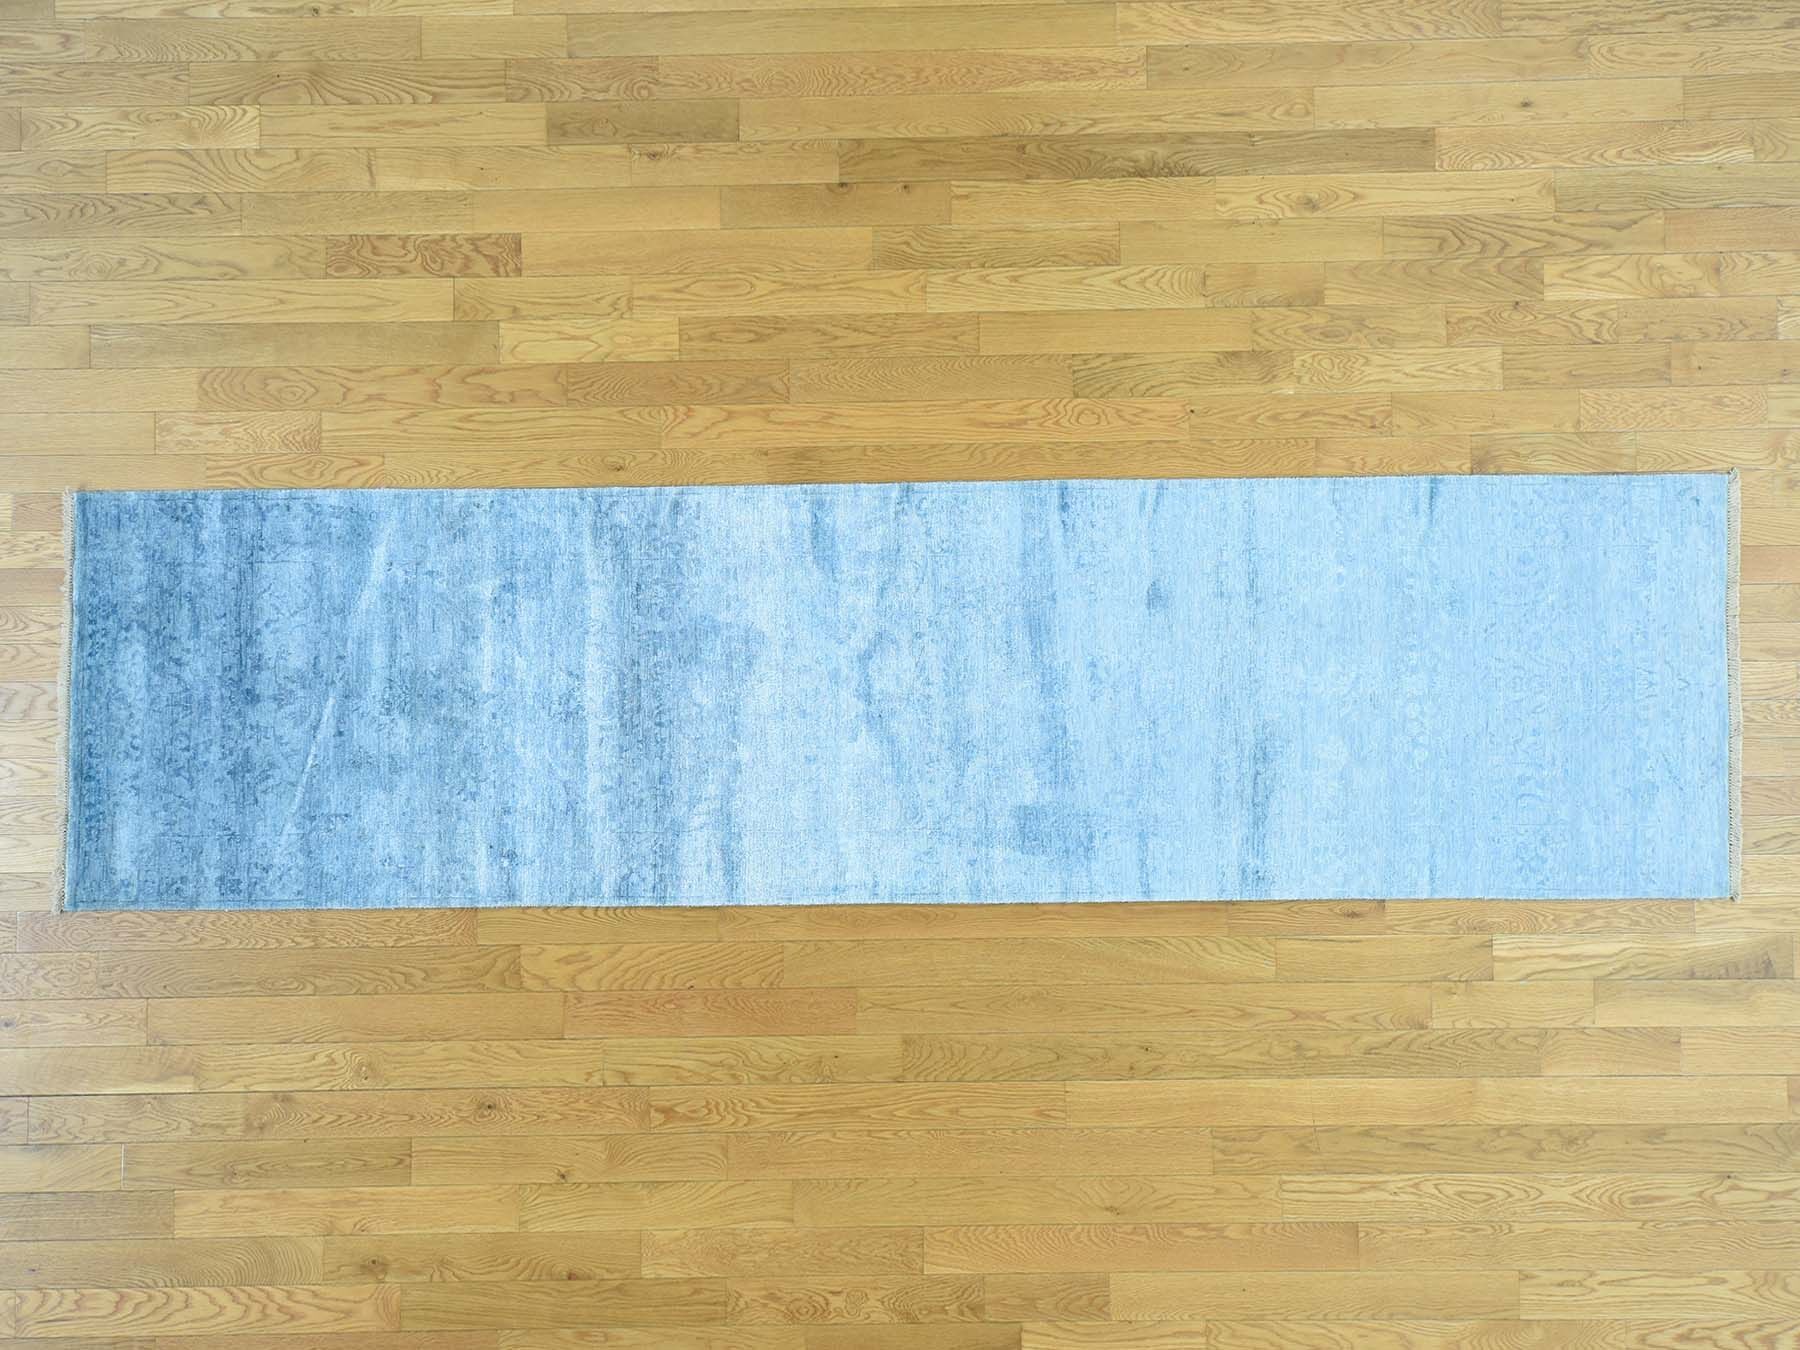 One-of-a-Kind Brazell Art Broken Design Handwoven Blue Silk Area Rug